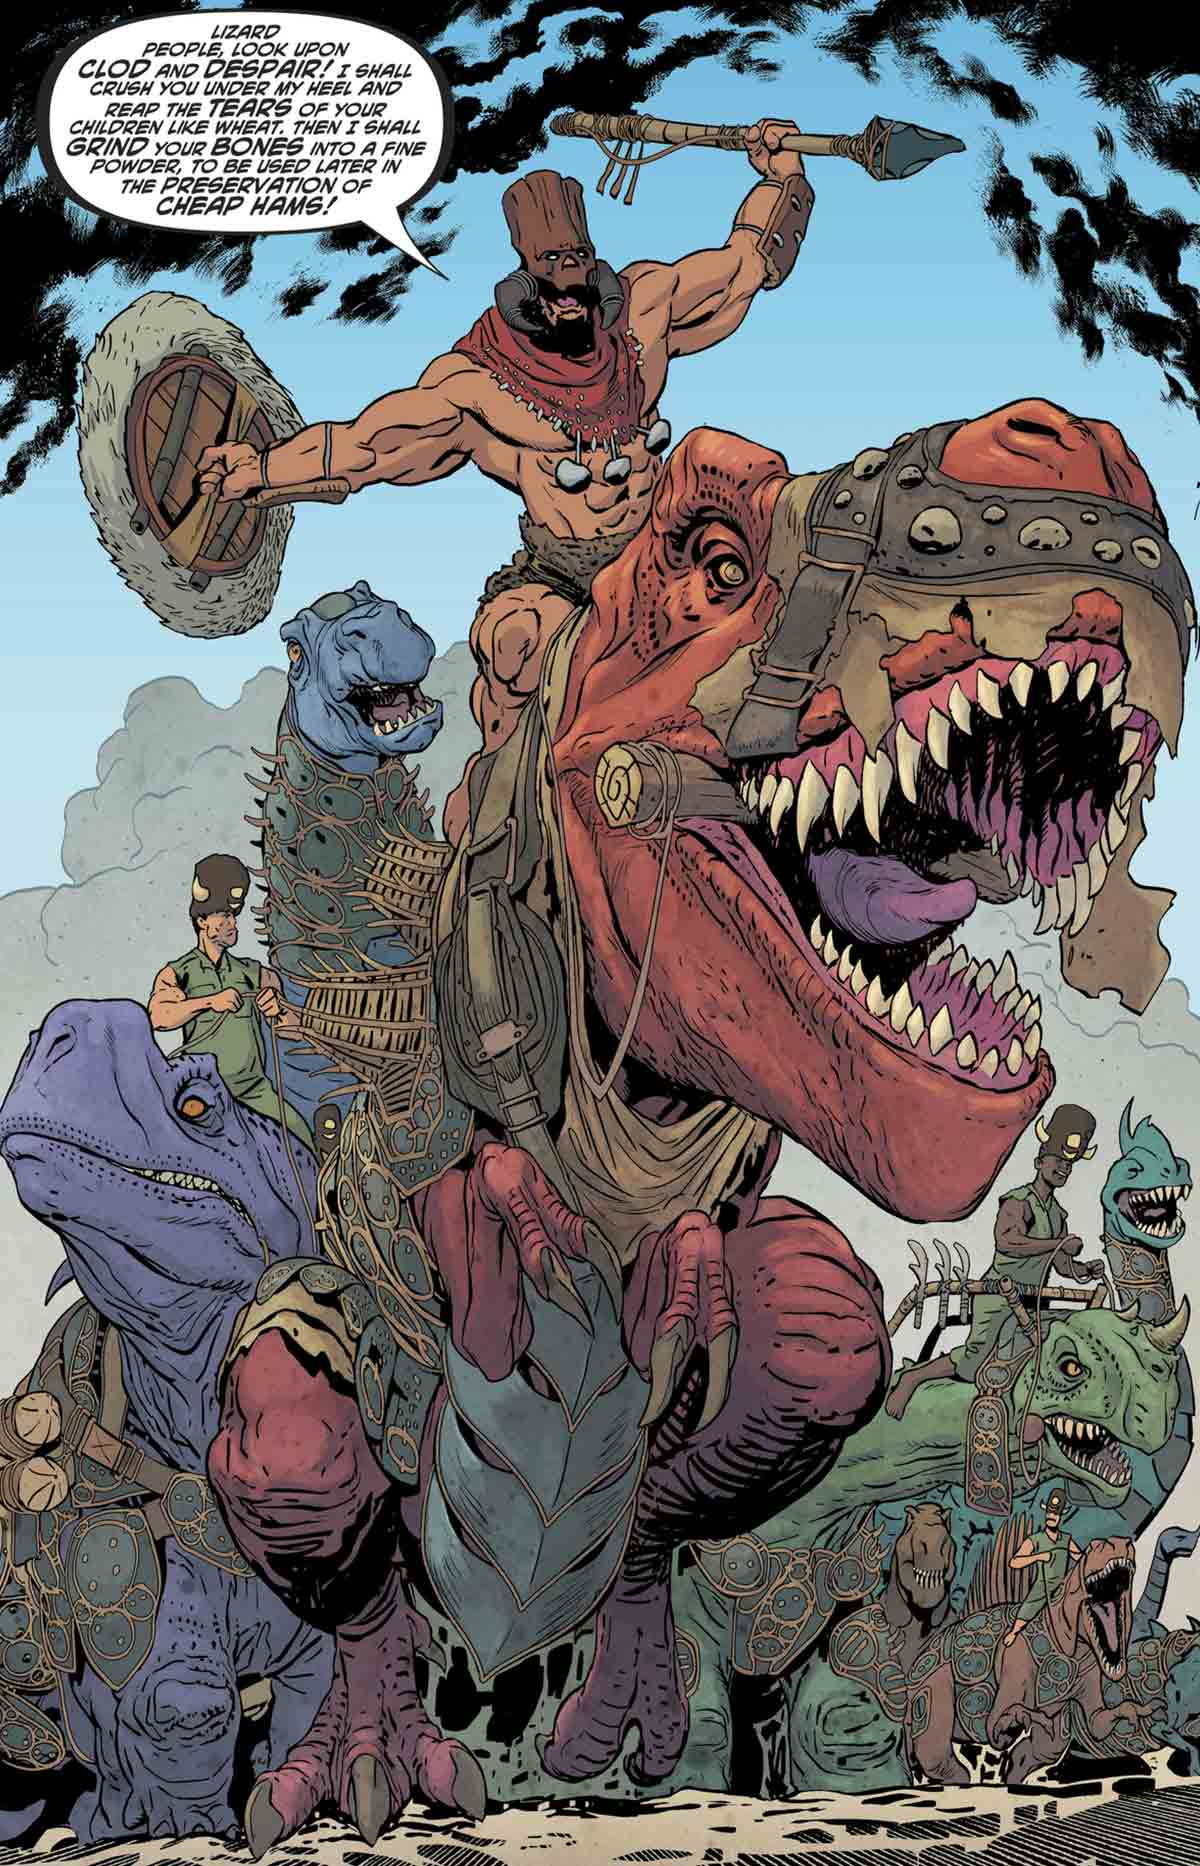 Página completa de 'The Flintstones'